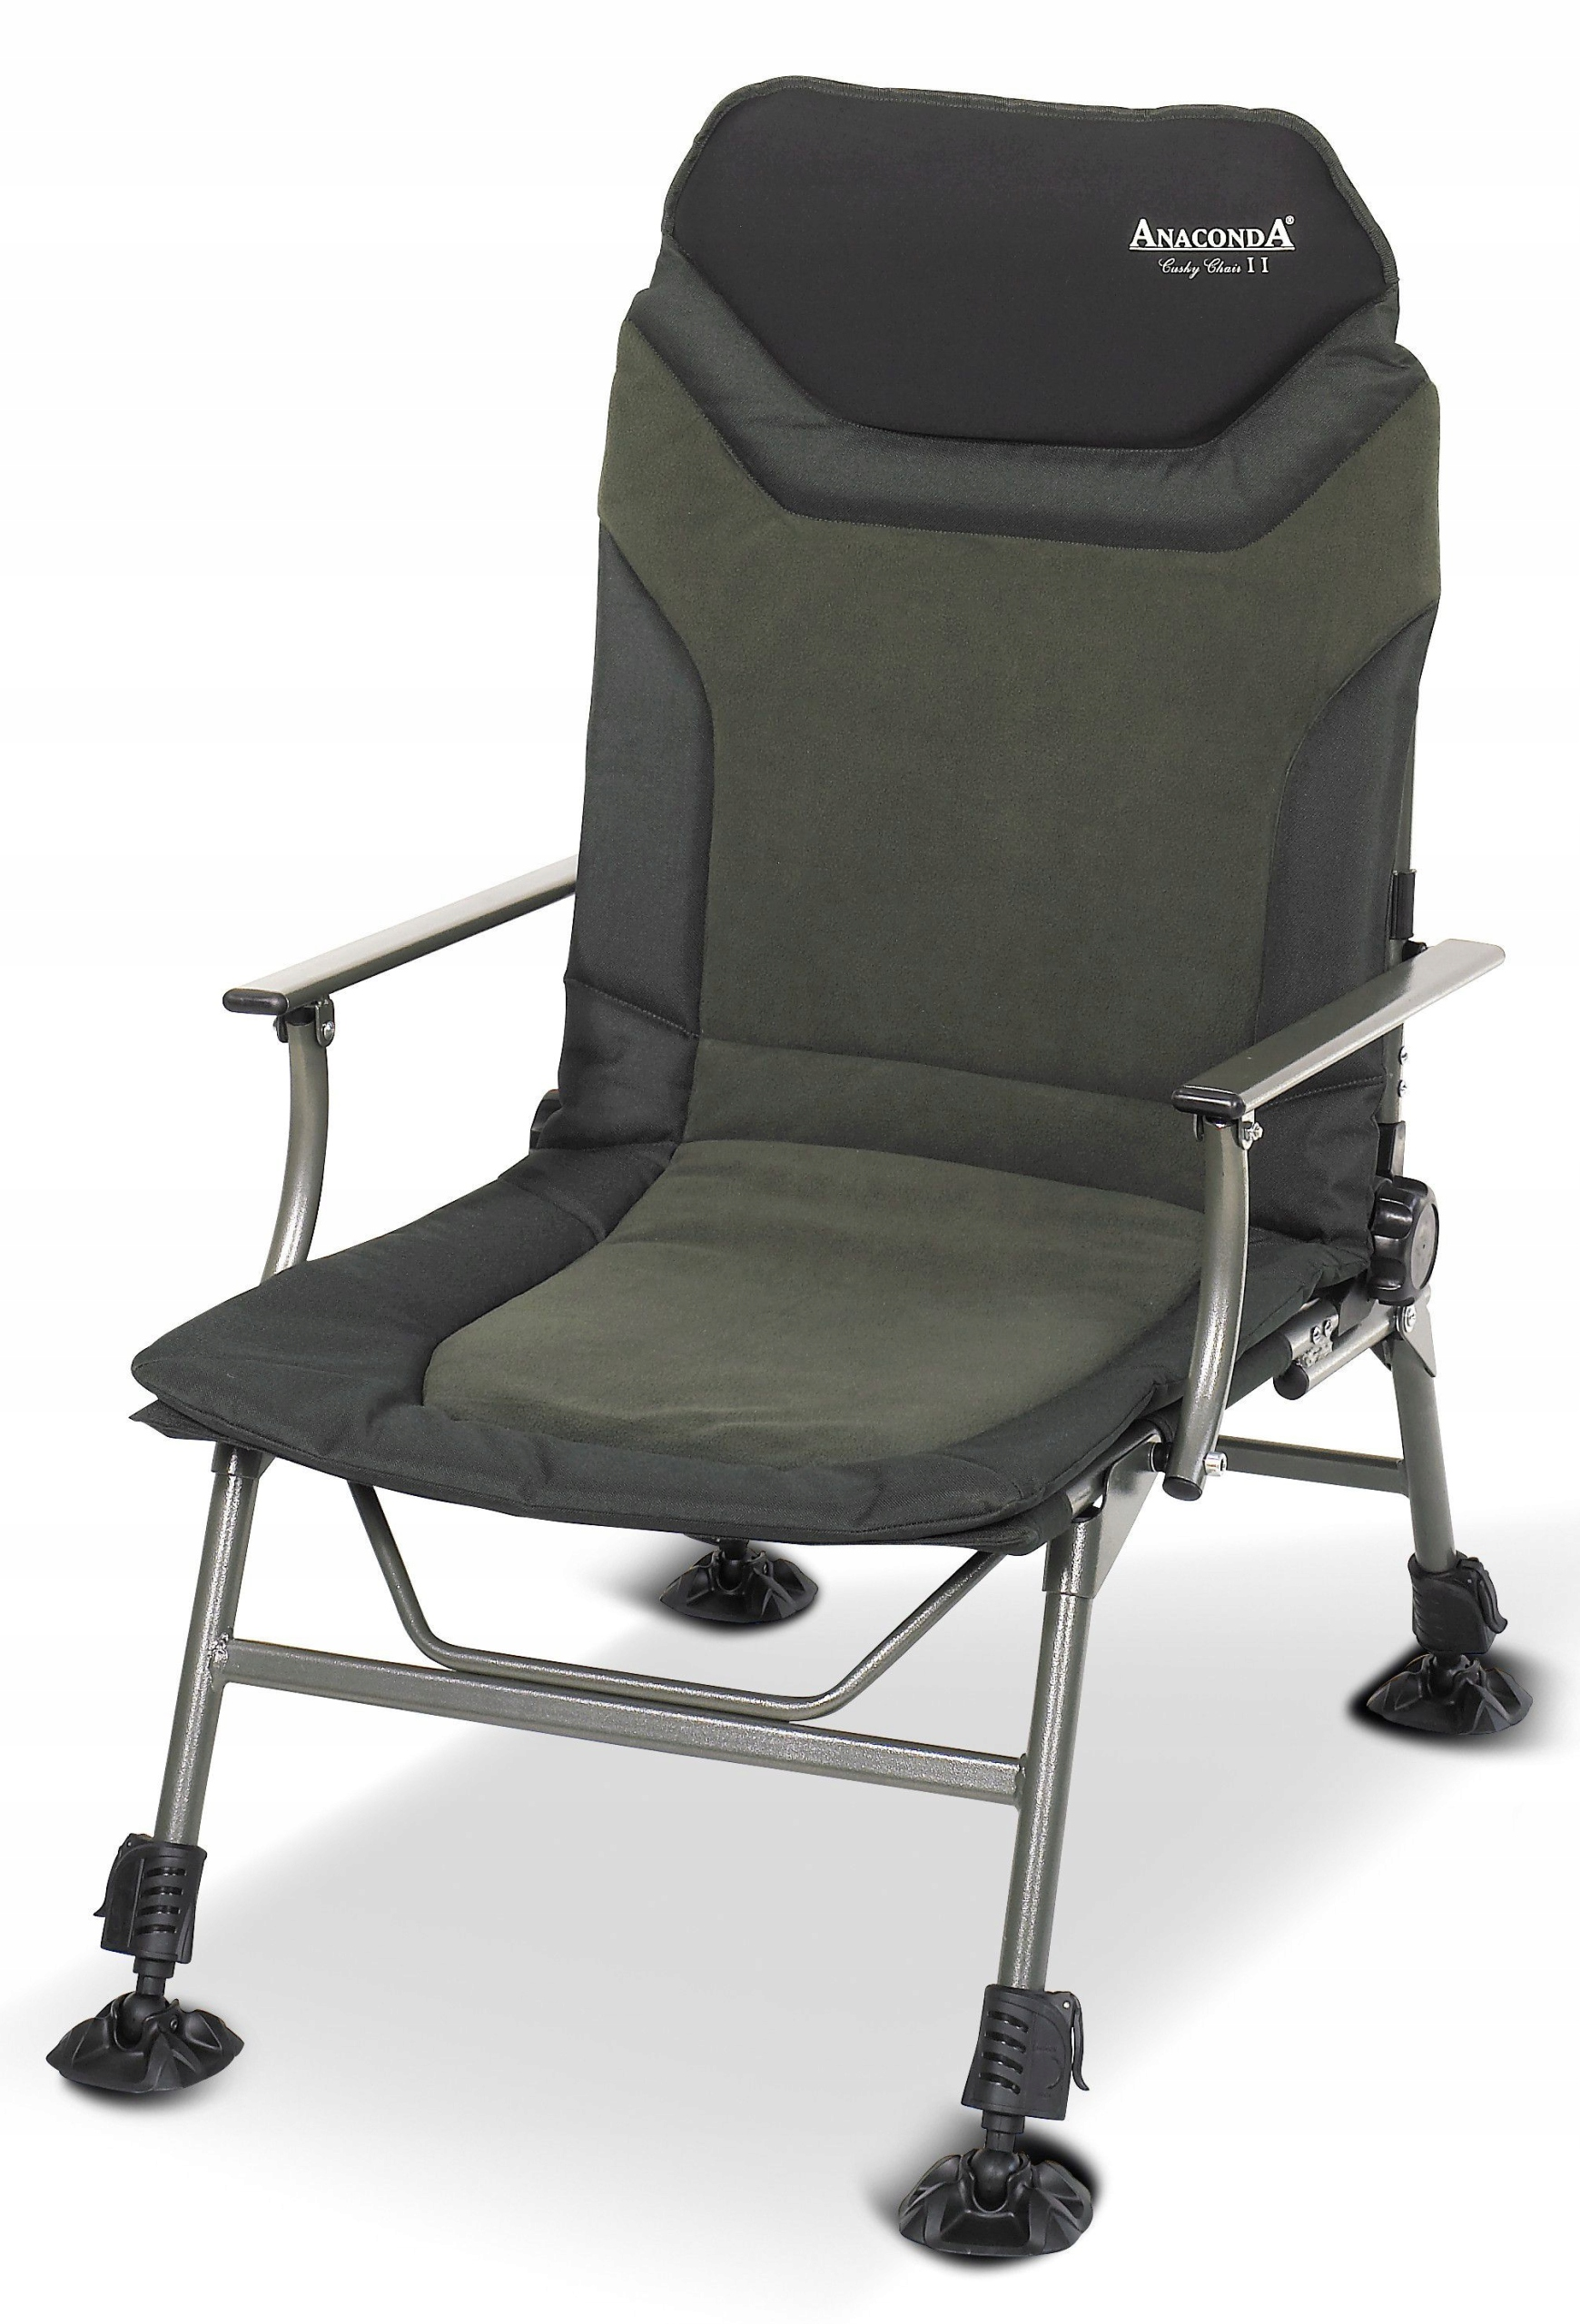 Anaconda Carp Chair II Kreslo